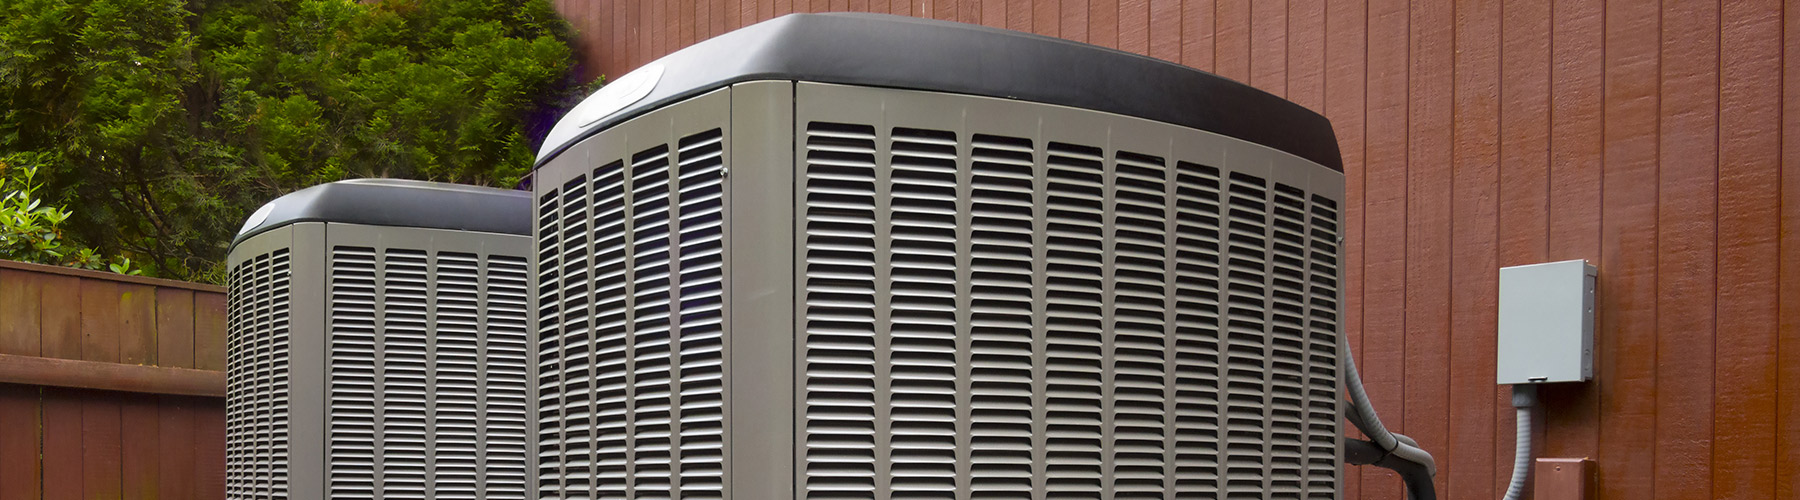 HVAC Customers